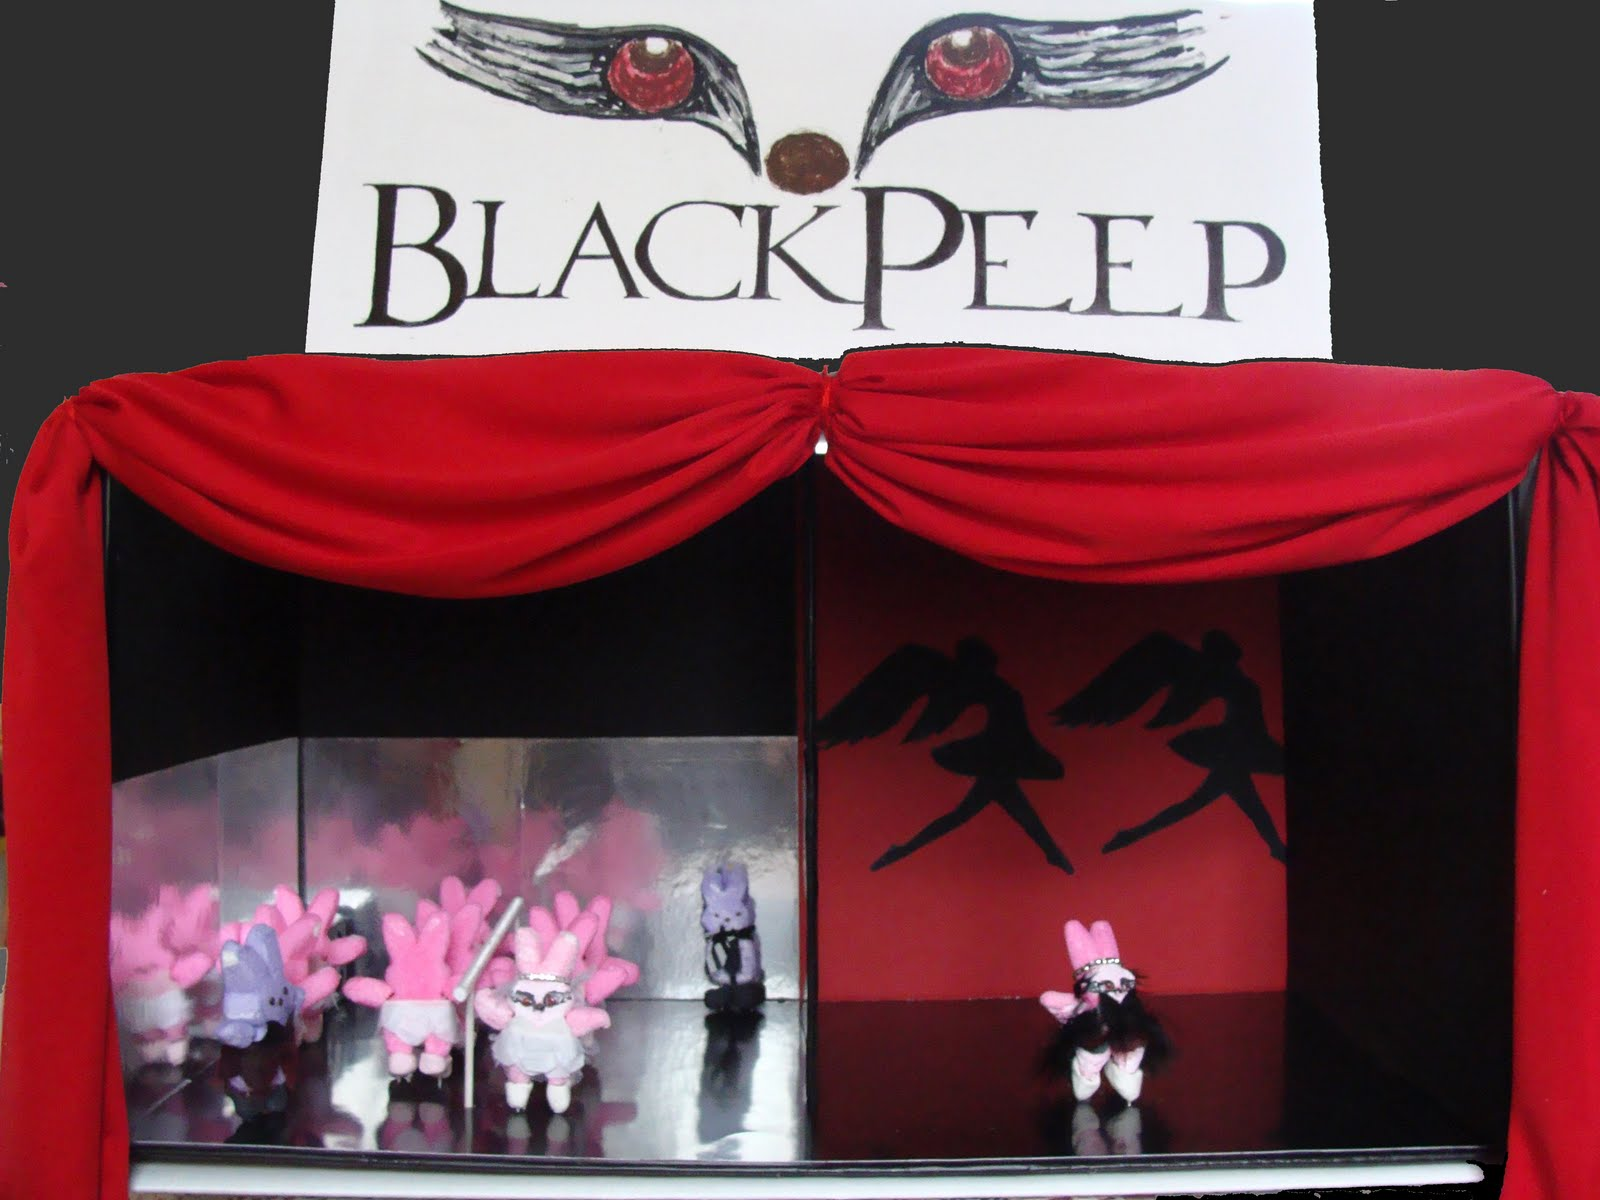 Black Swan peeps diorama